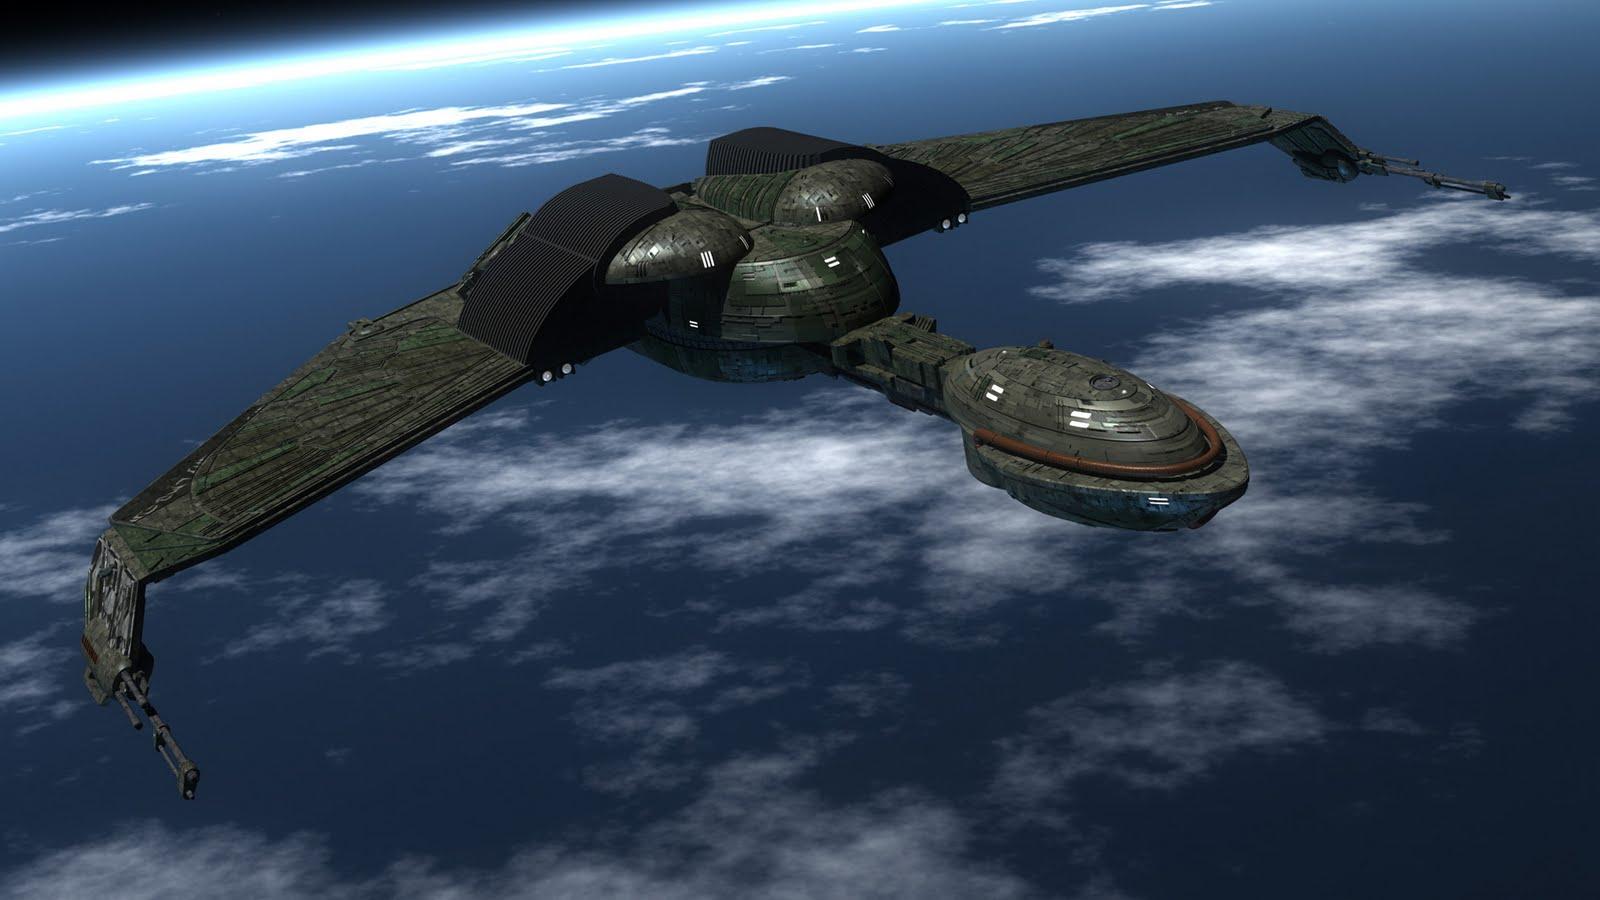 klingon%2Bbird%2Bof%2Bprey.jpg